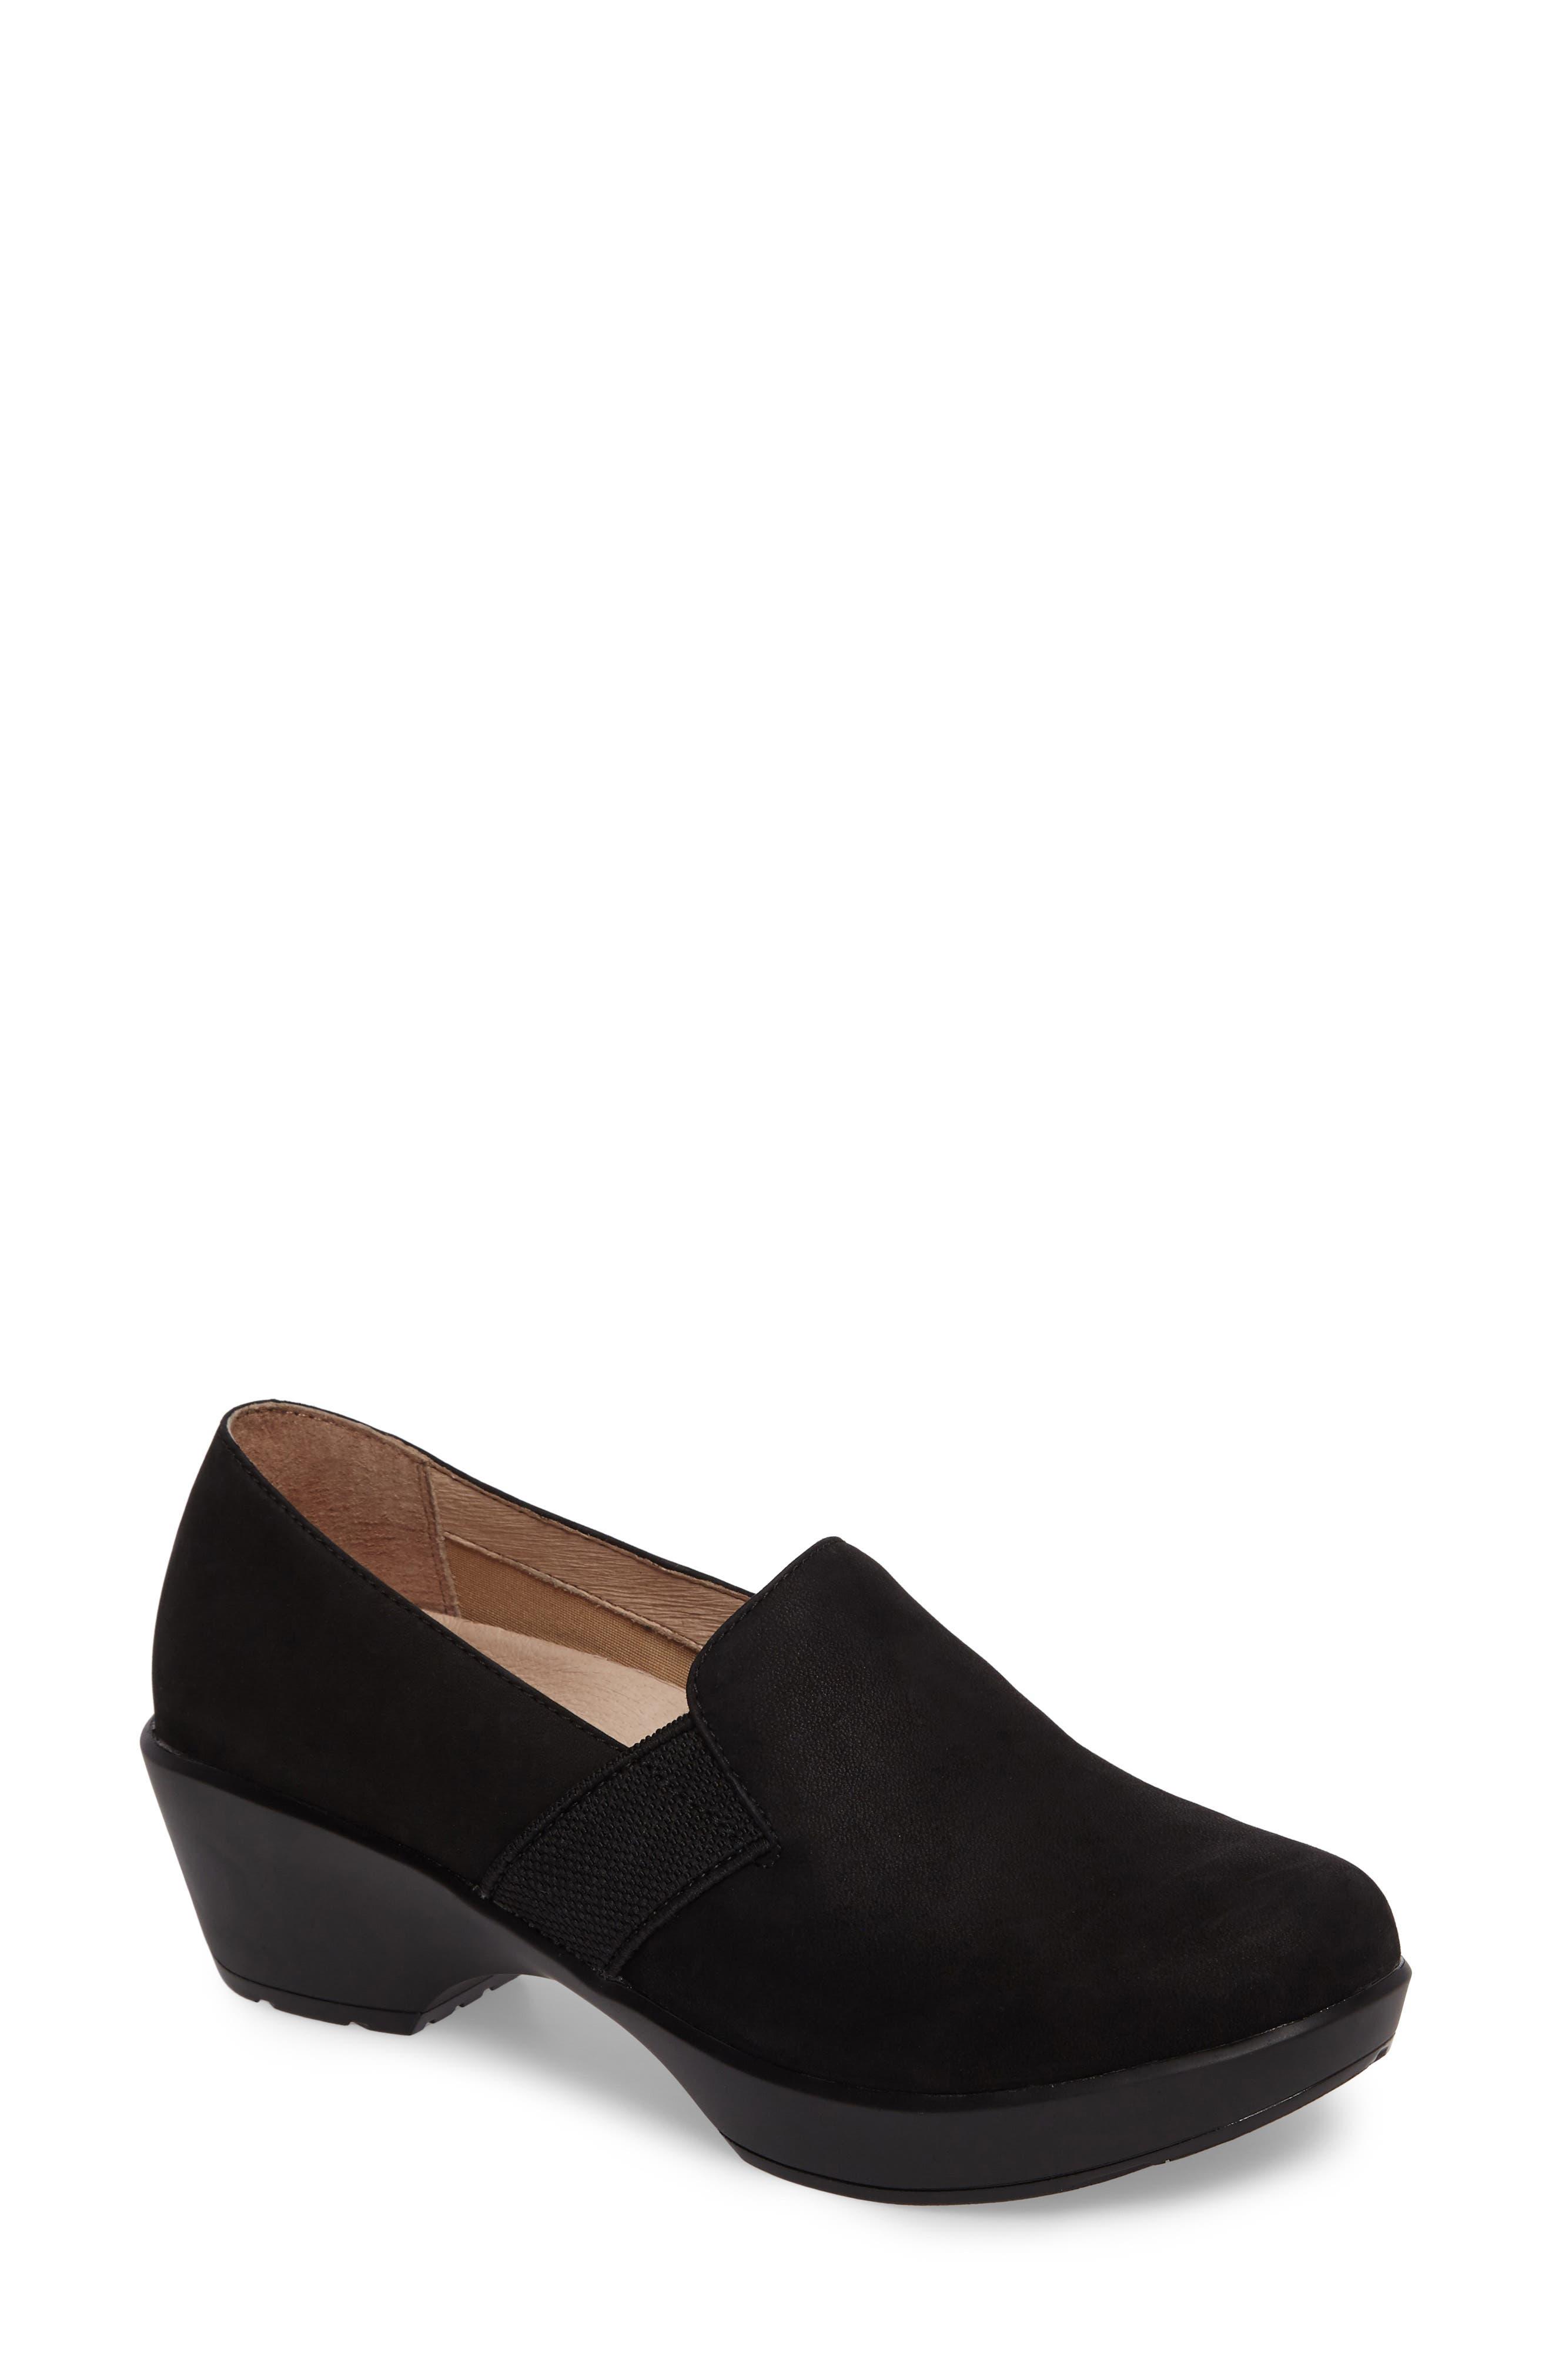 Main Image - Dansko 'Jessica' Platform Loafer (Women)